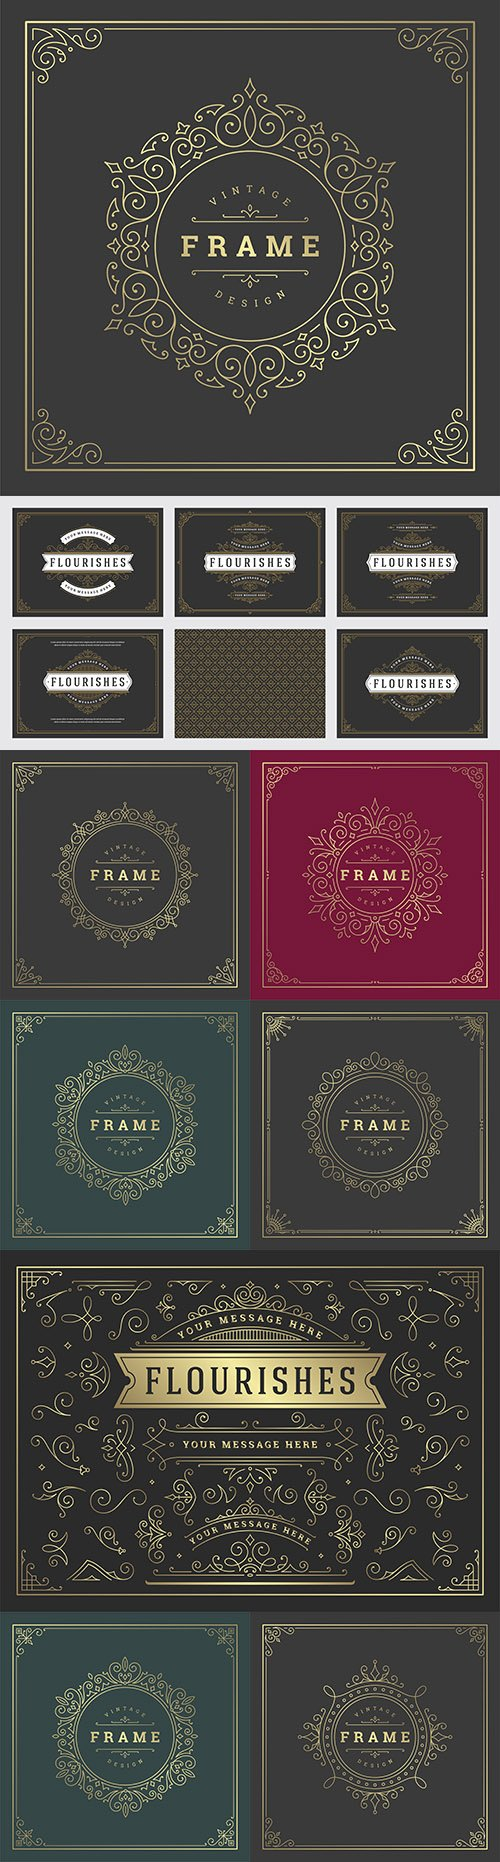 Vintage decorative ornament frame line design template